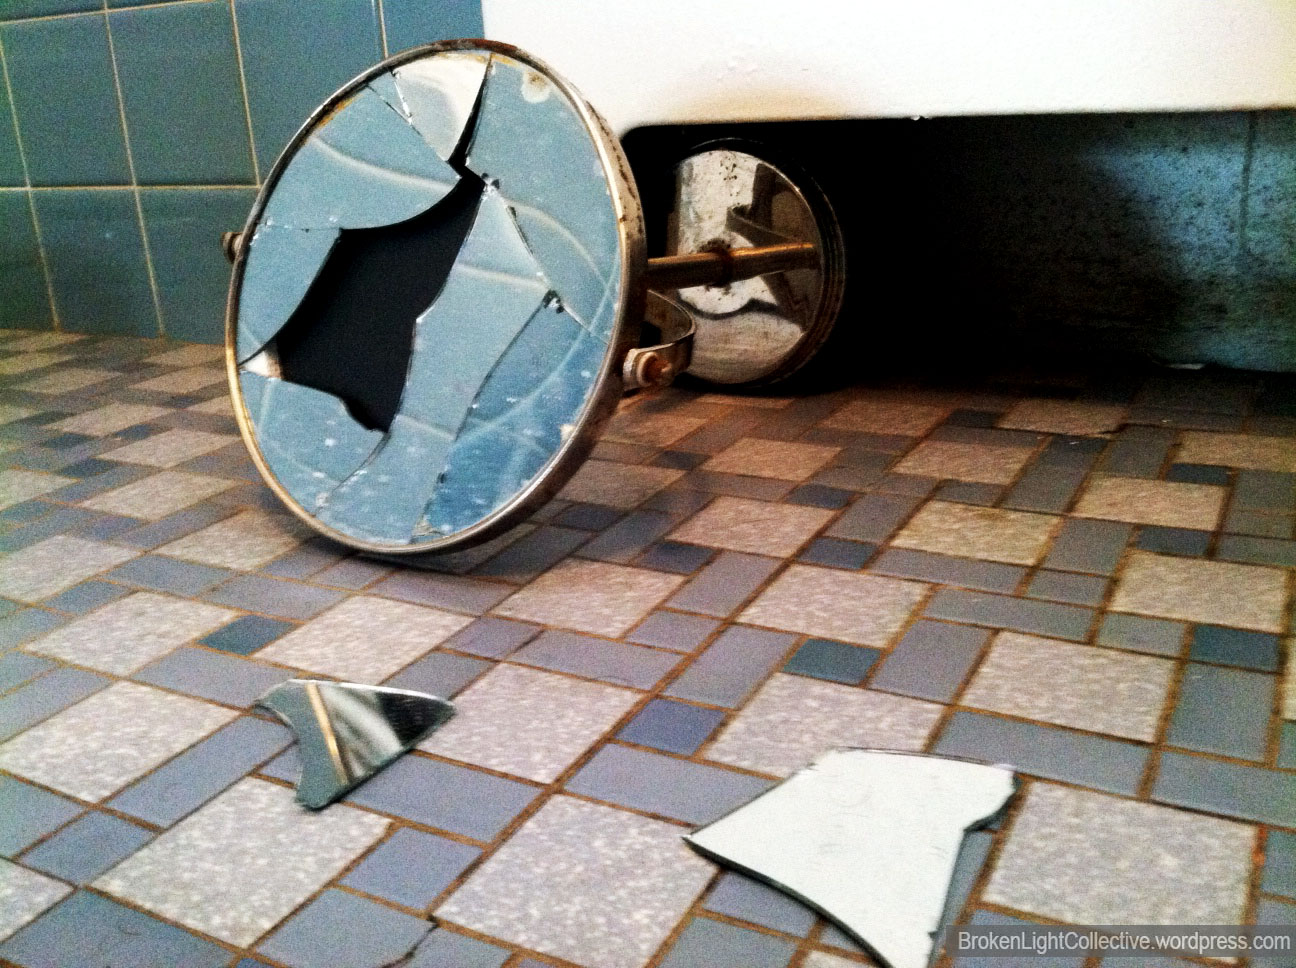 Broken Broken Light A Photography Collective. Broken Bathroom Mirror